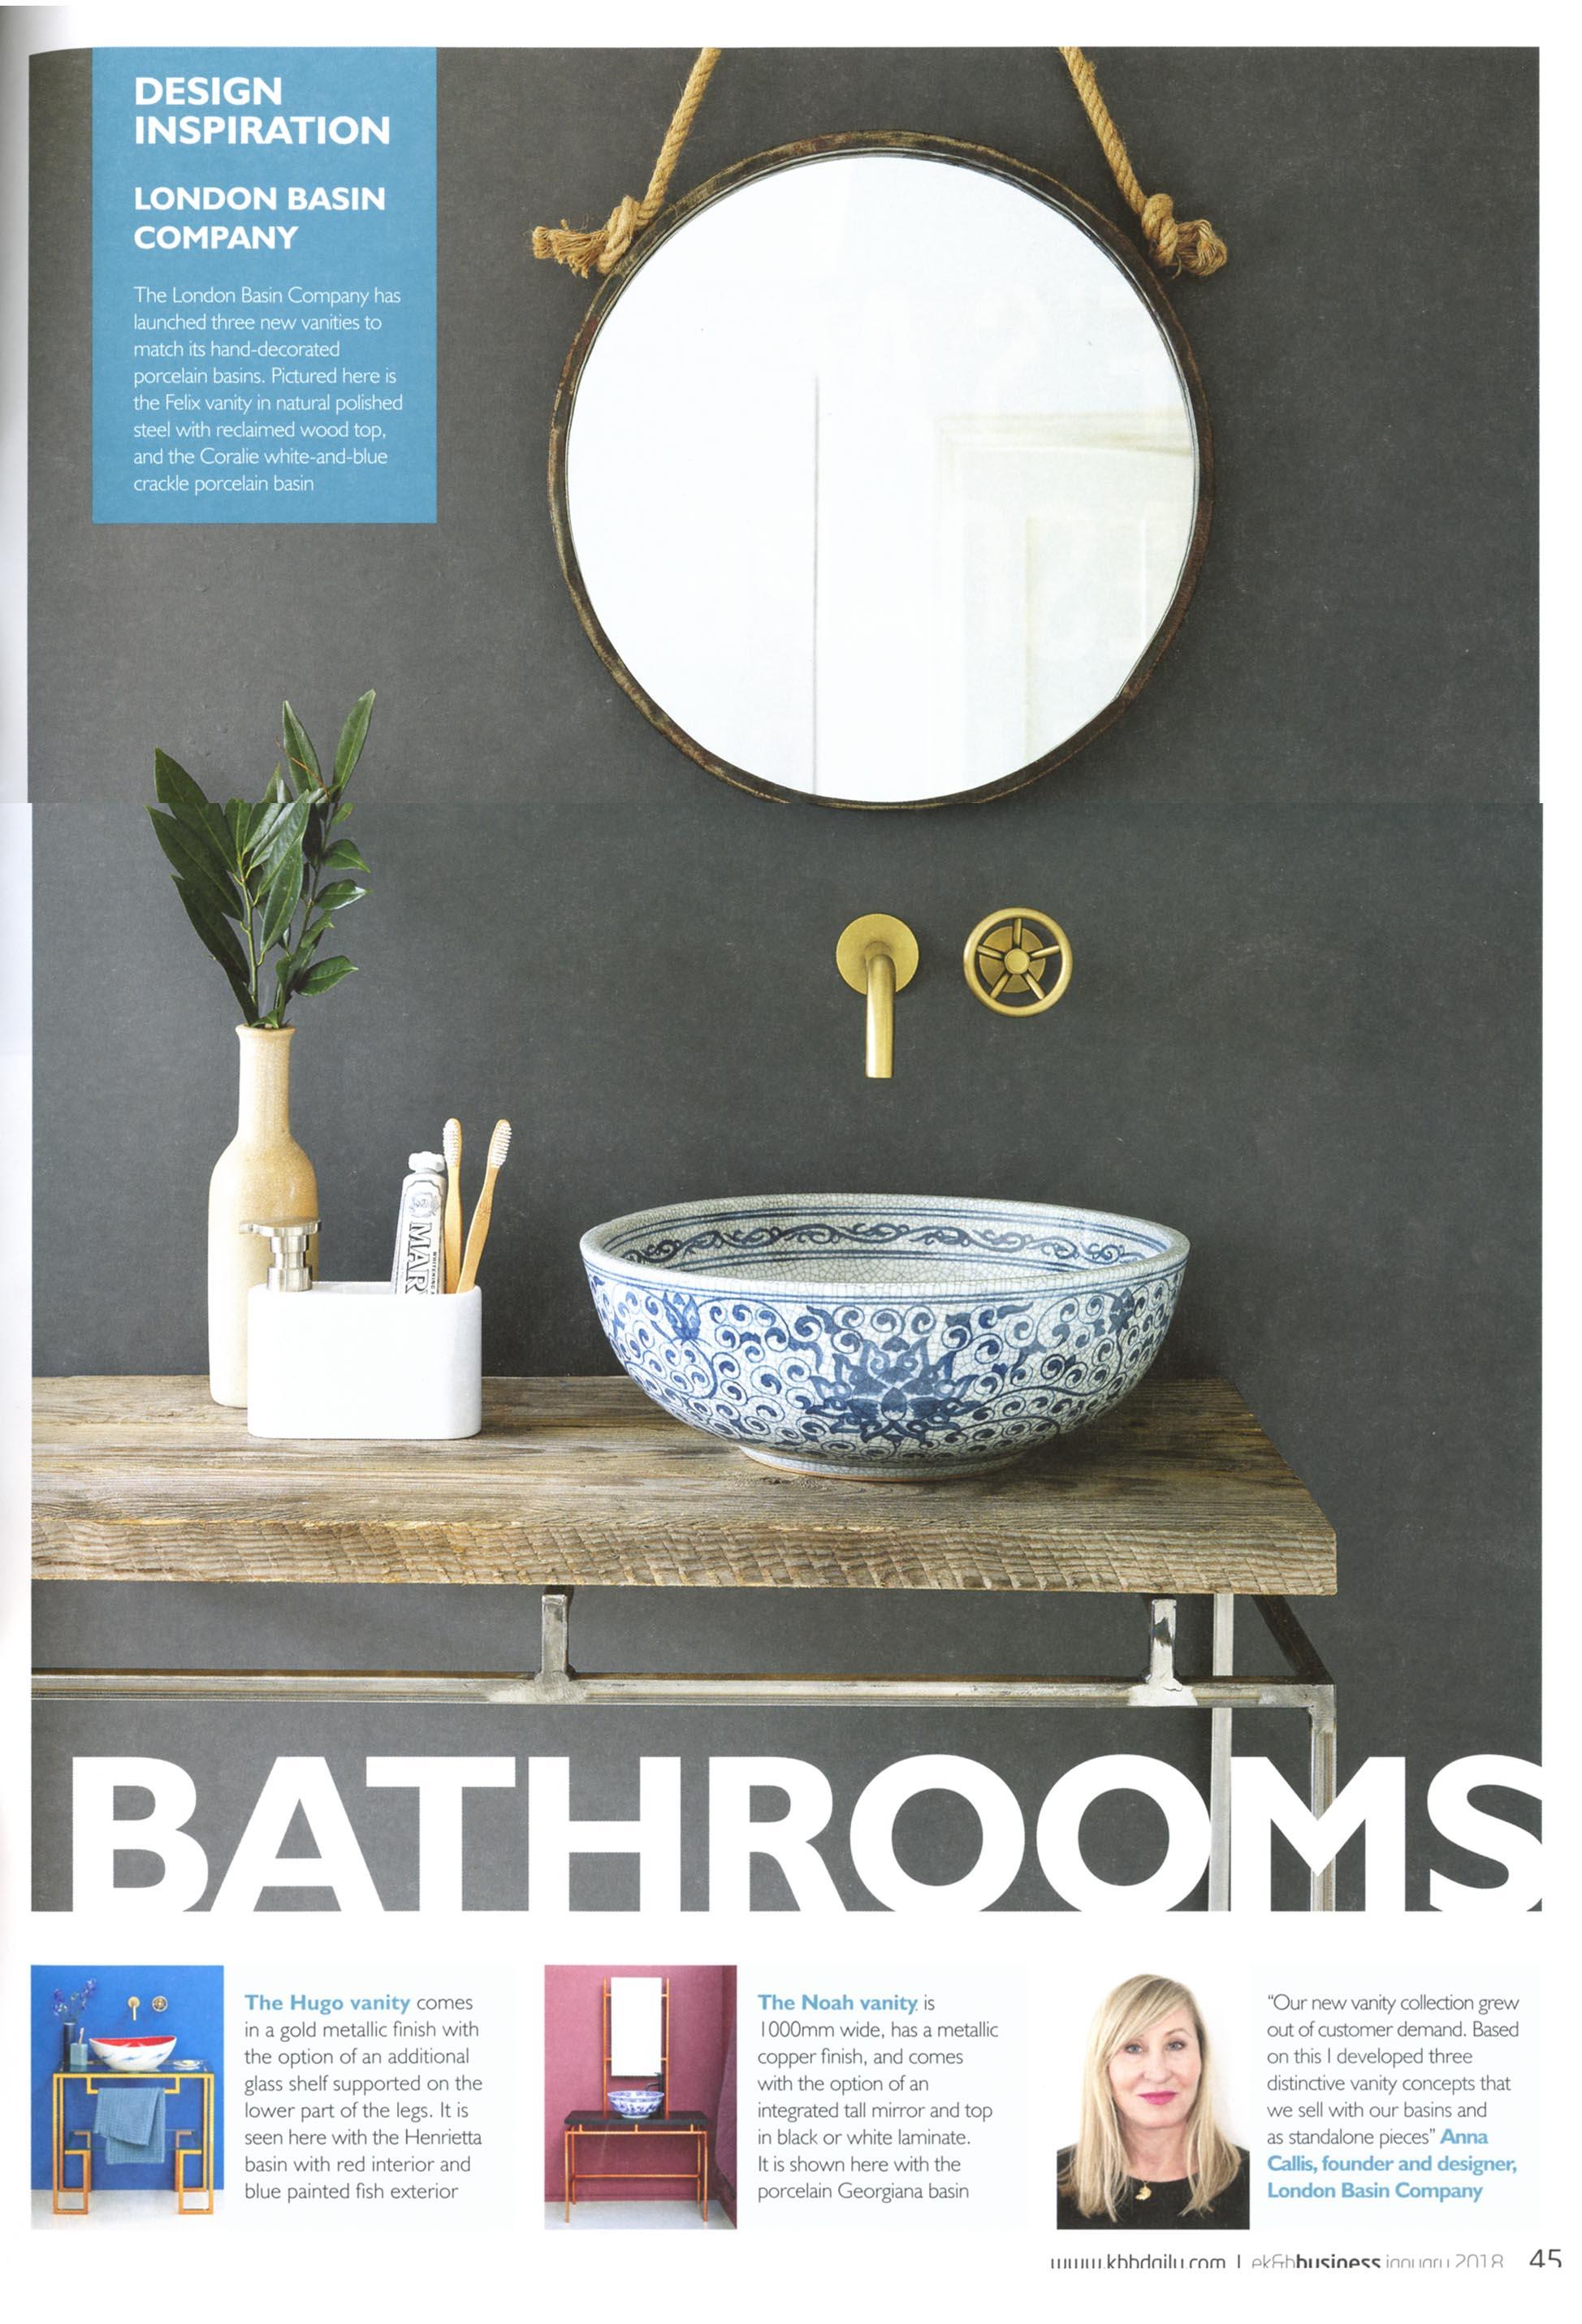 Essential Kitchen & Bathroom Business January 2018 LBC.jpg